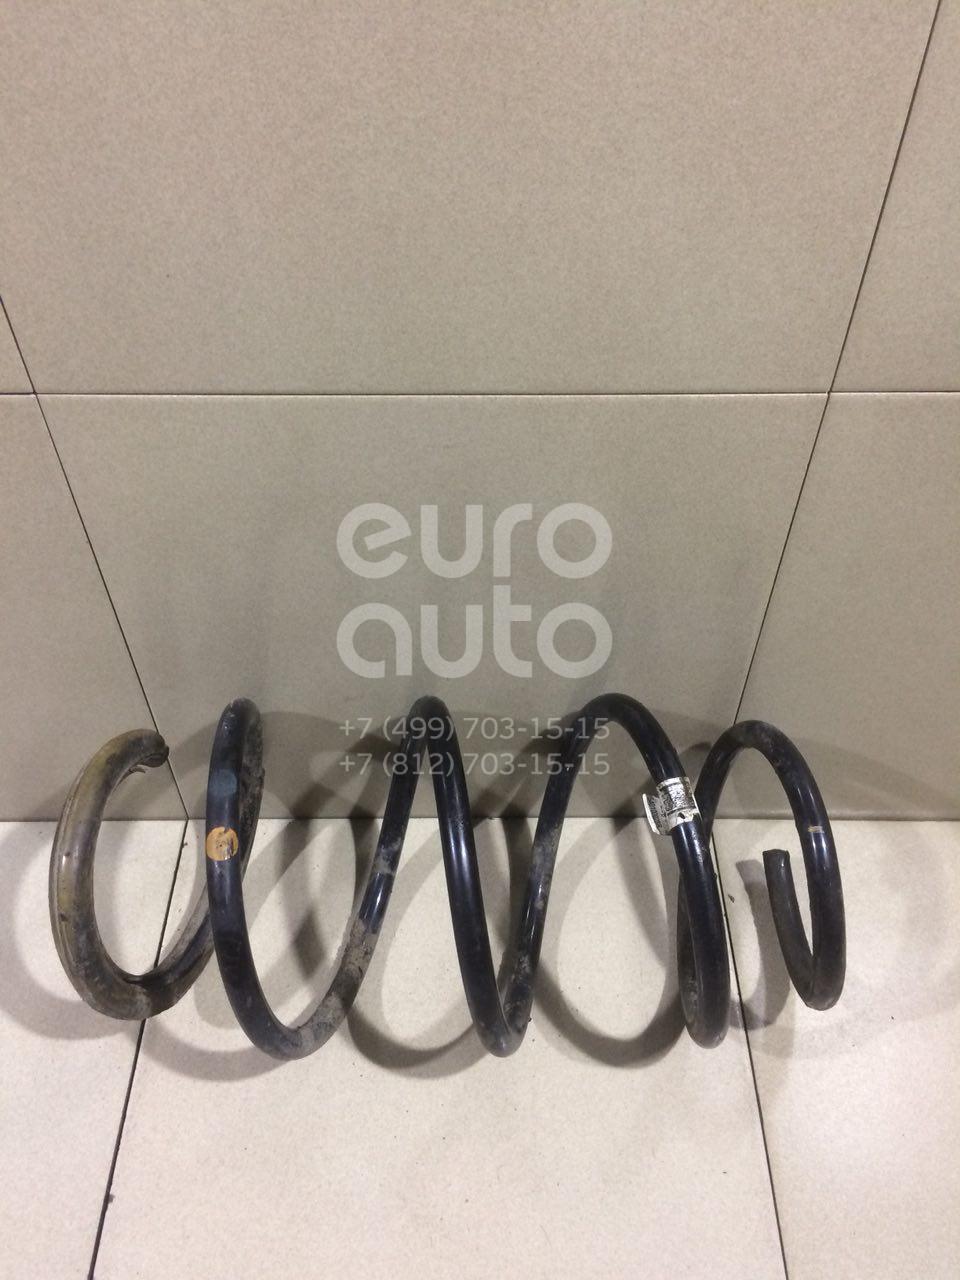 Купить Пружина передняя Renault Scenic III 2009-2015; (540100028R)